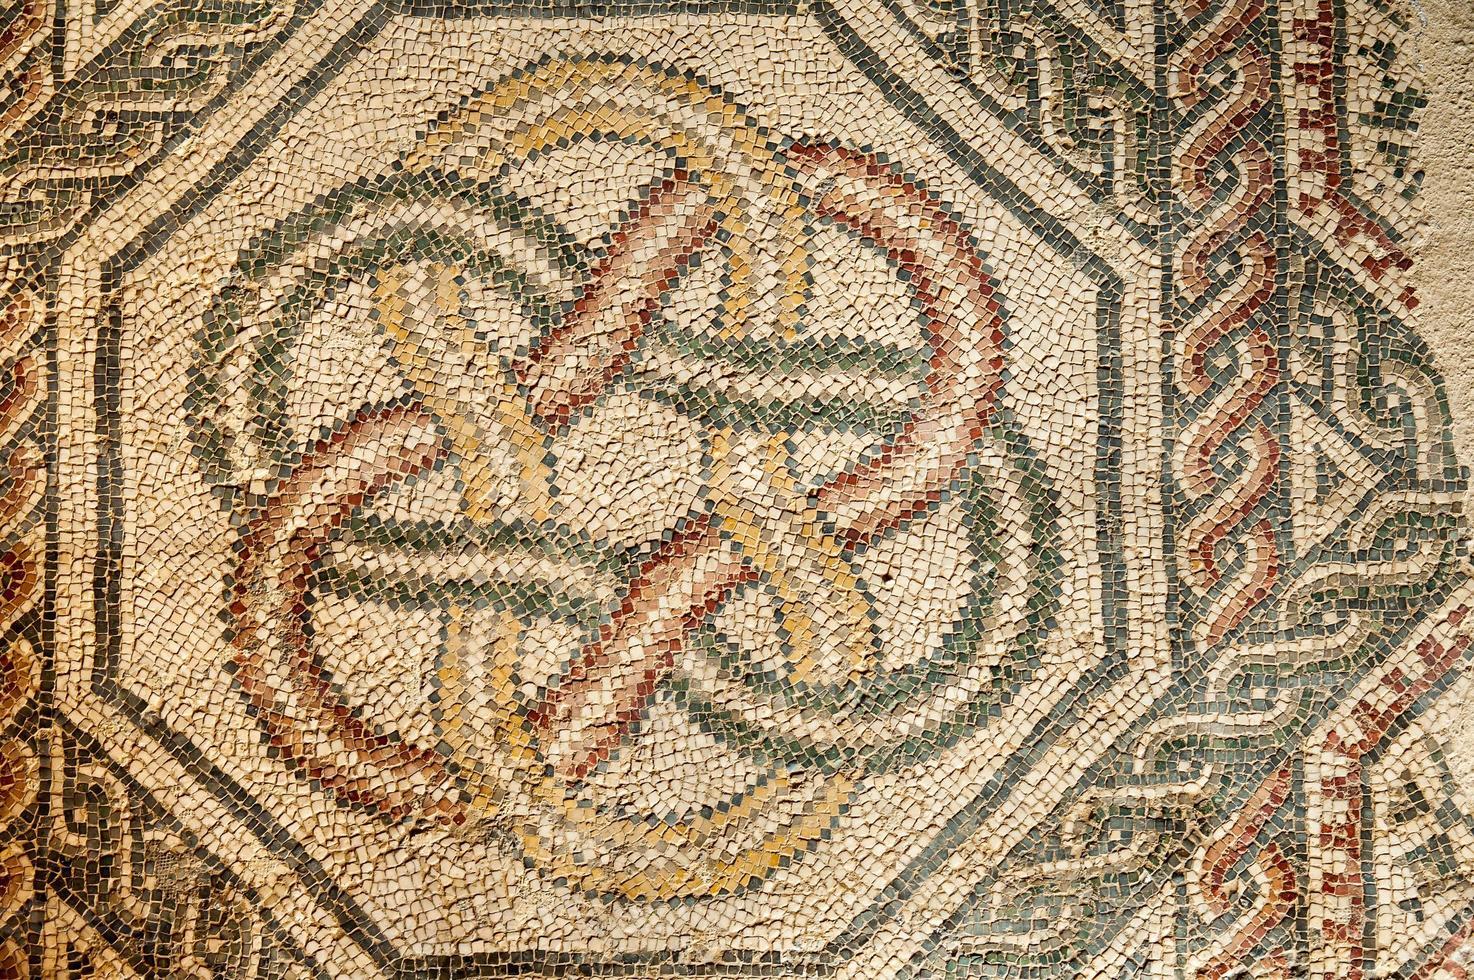 Roman mosaics photo